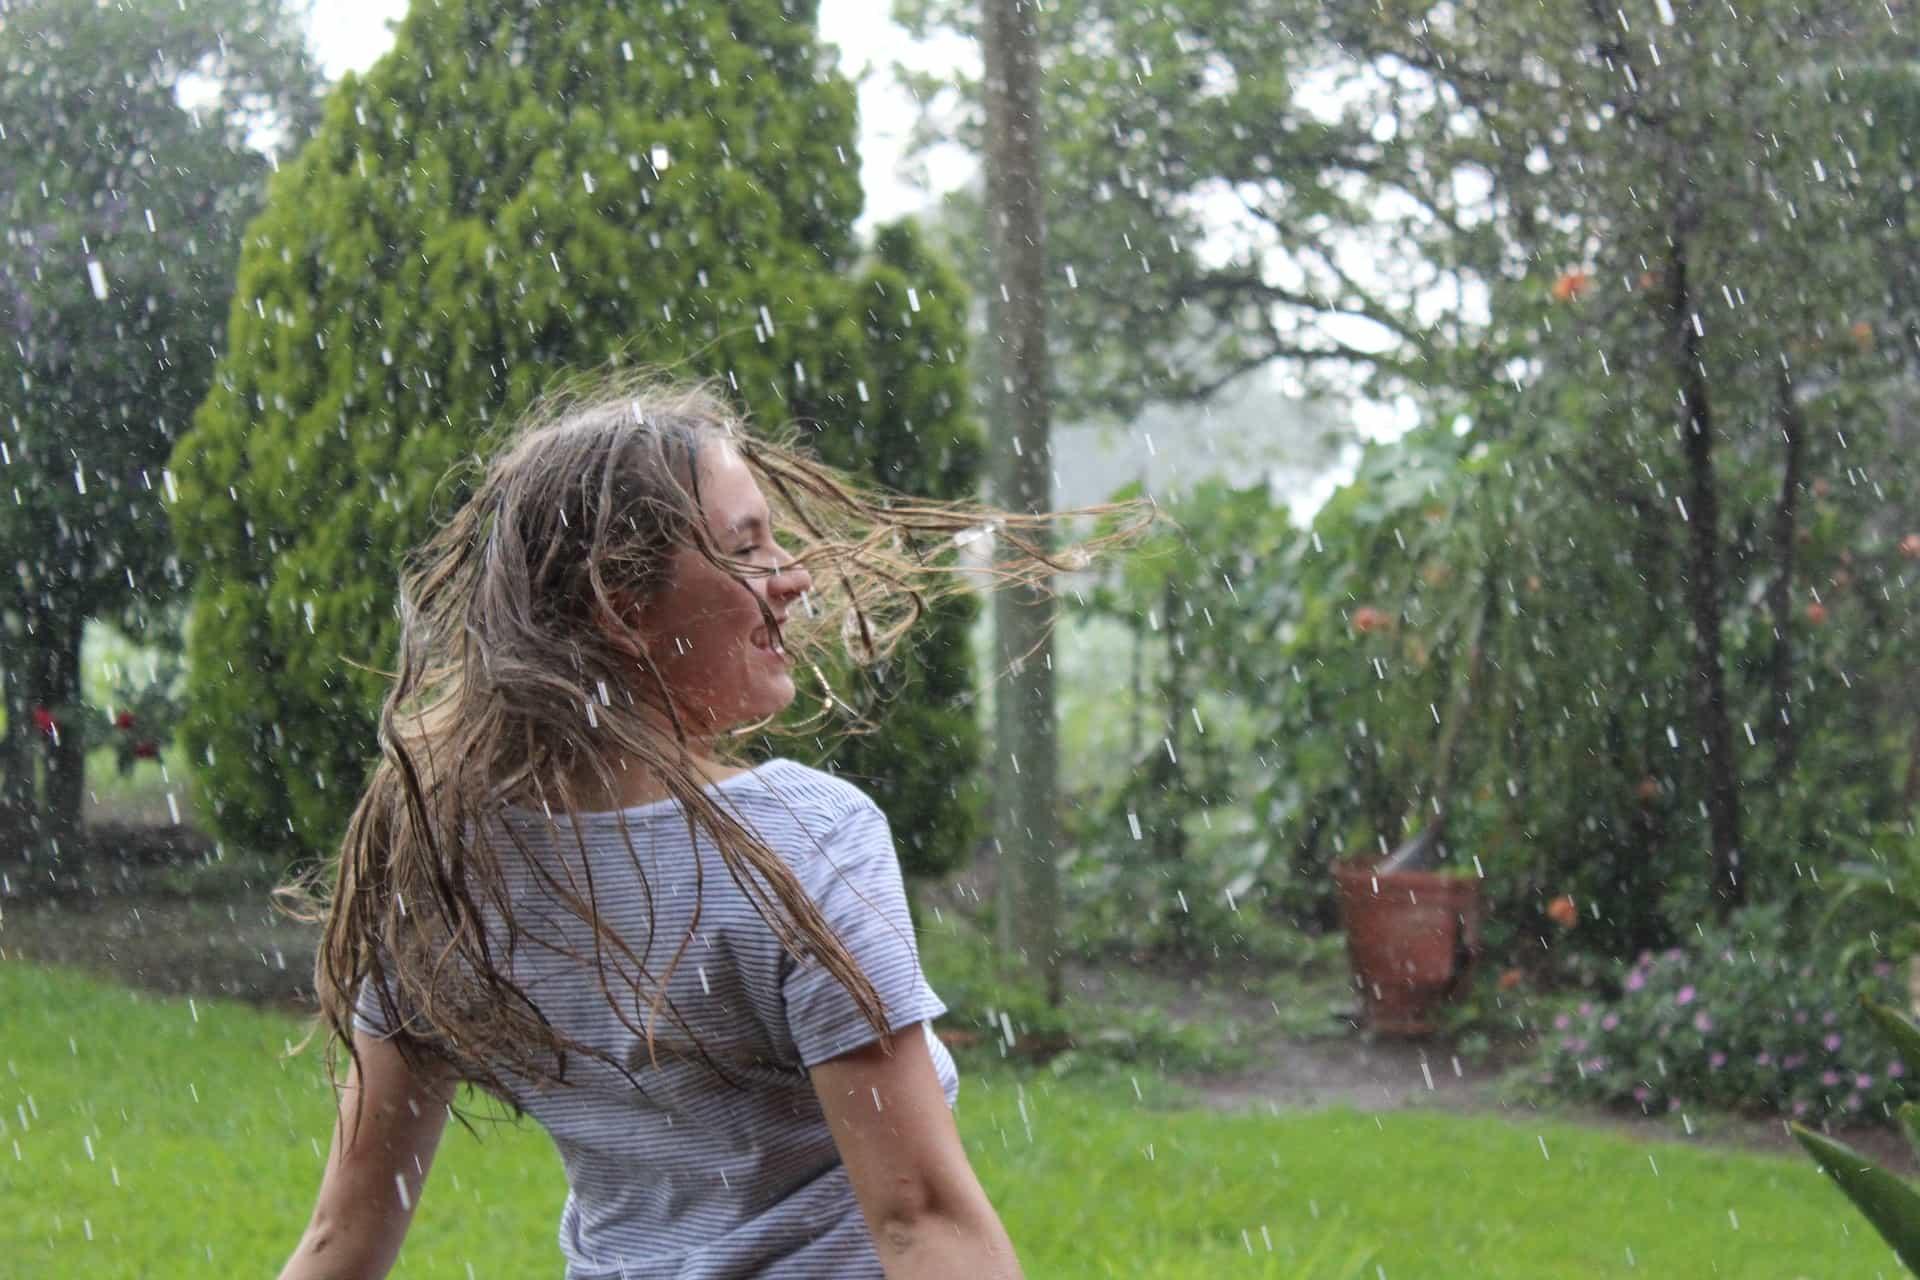 Dem Regenwetter trotzen